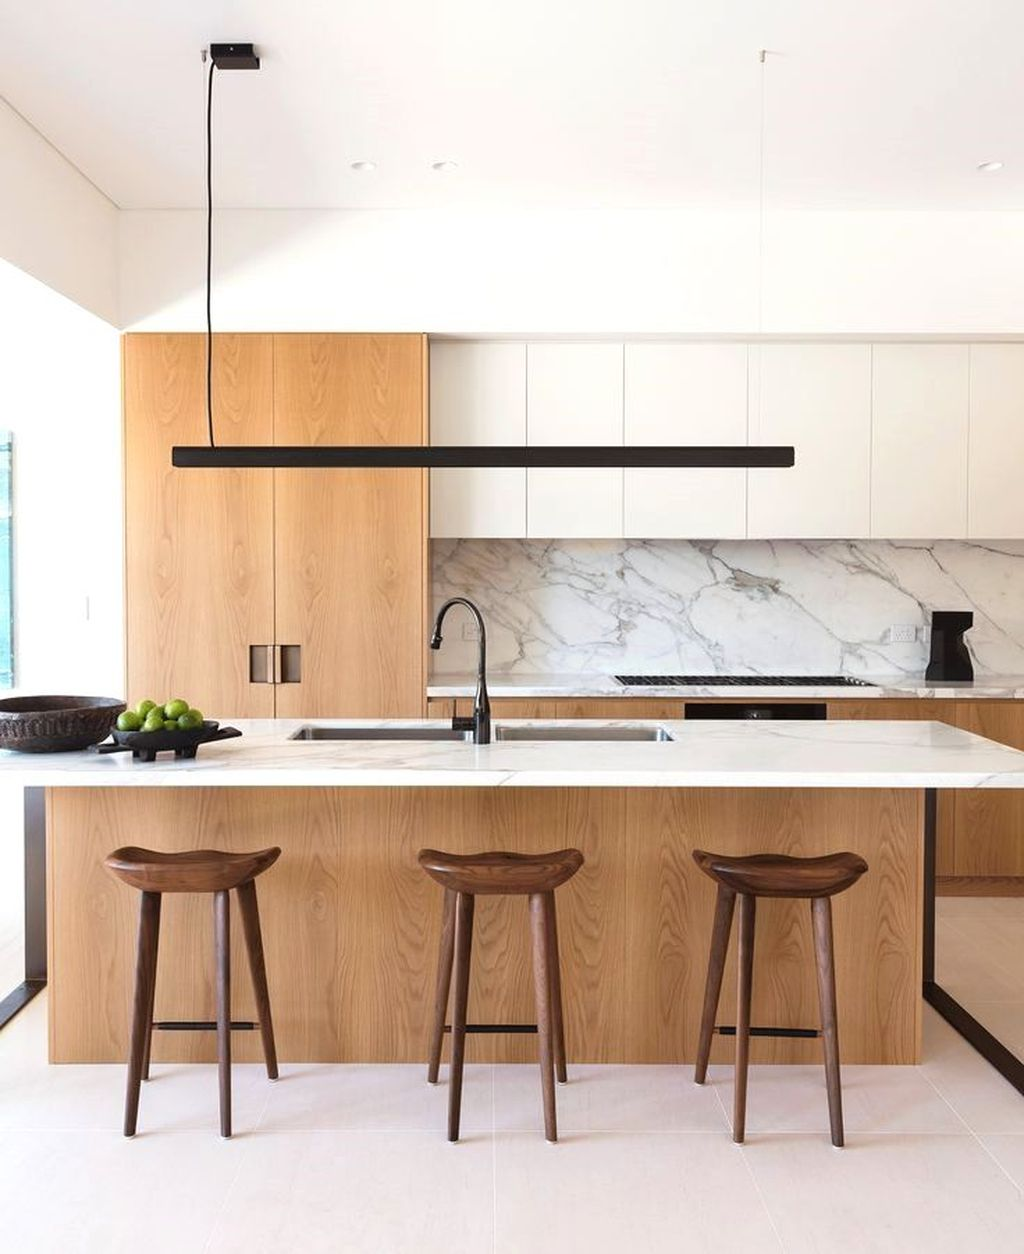 Popular Minimalist Kitchen Design Ideas You Never Seen Before 14